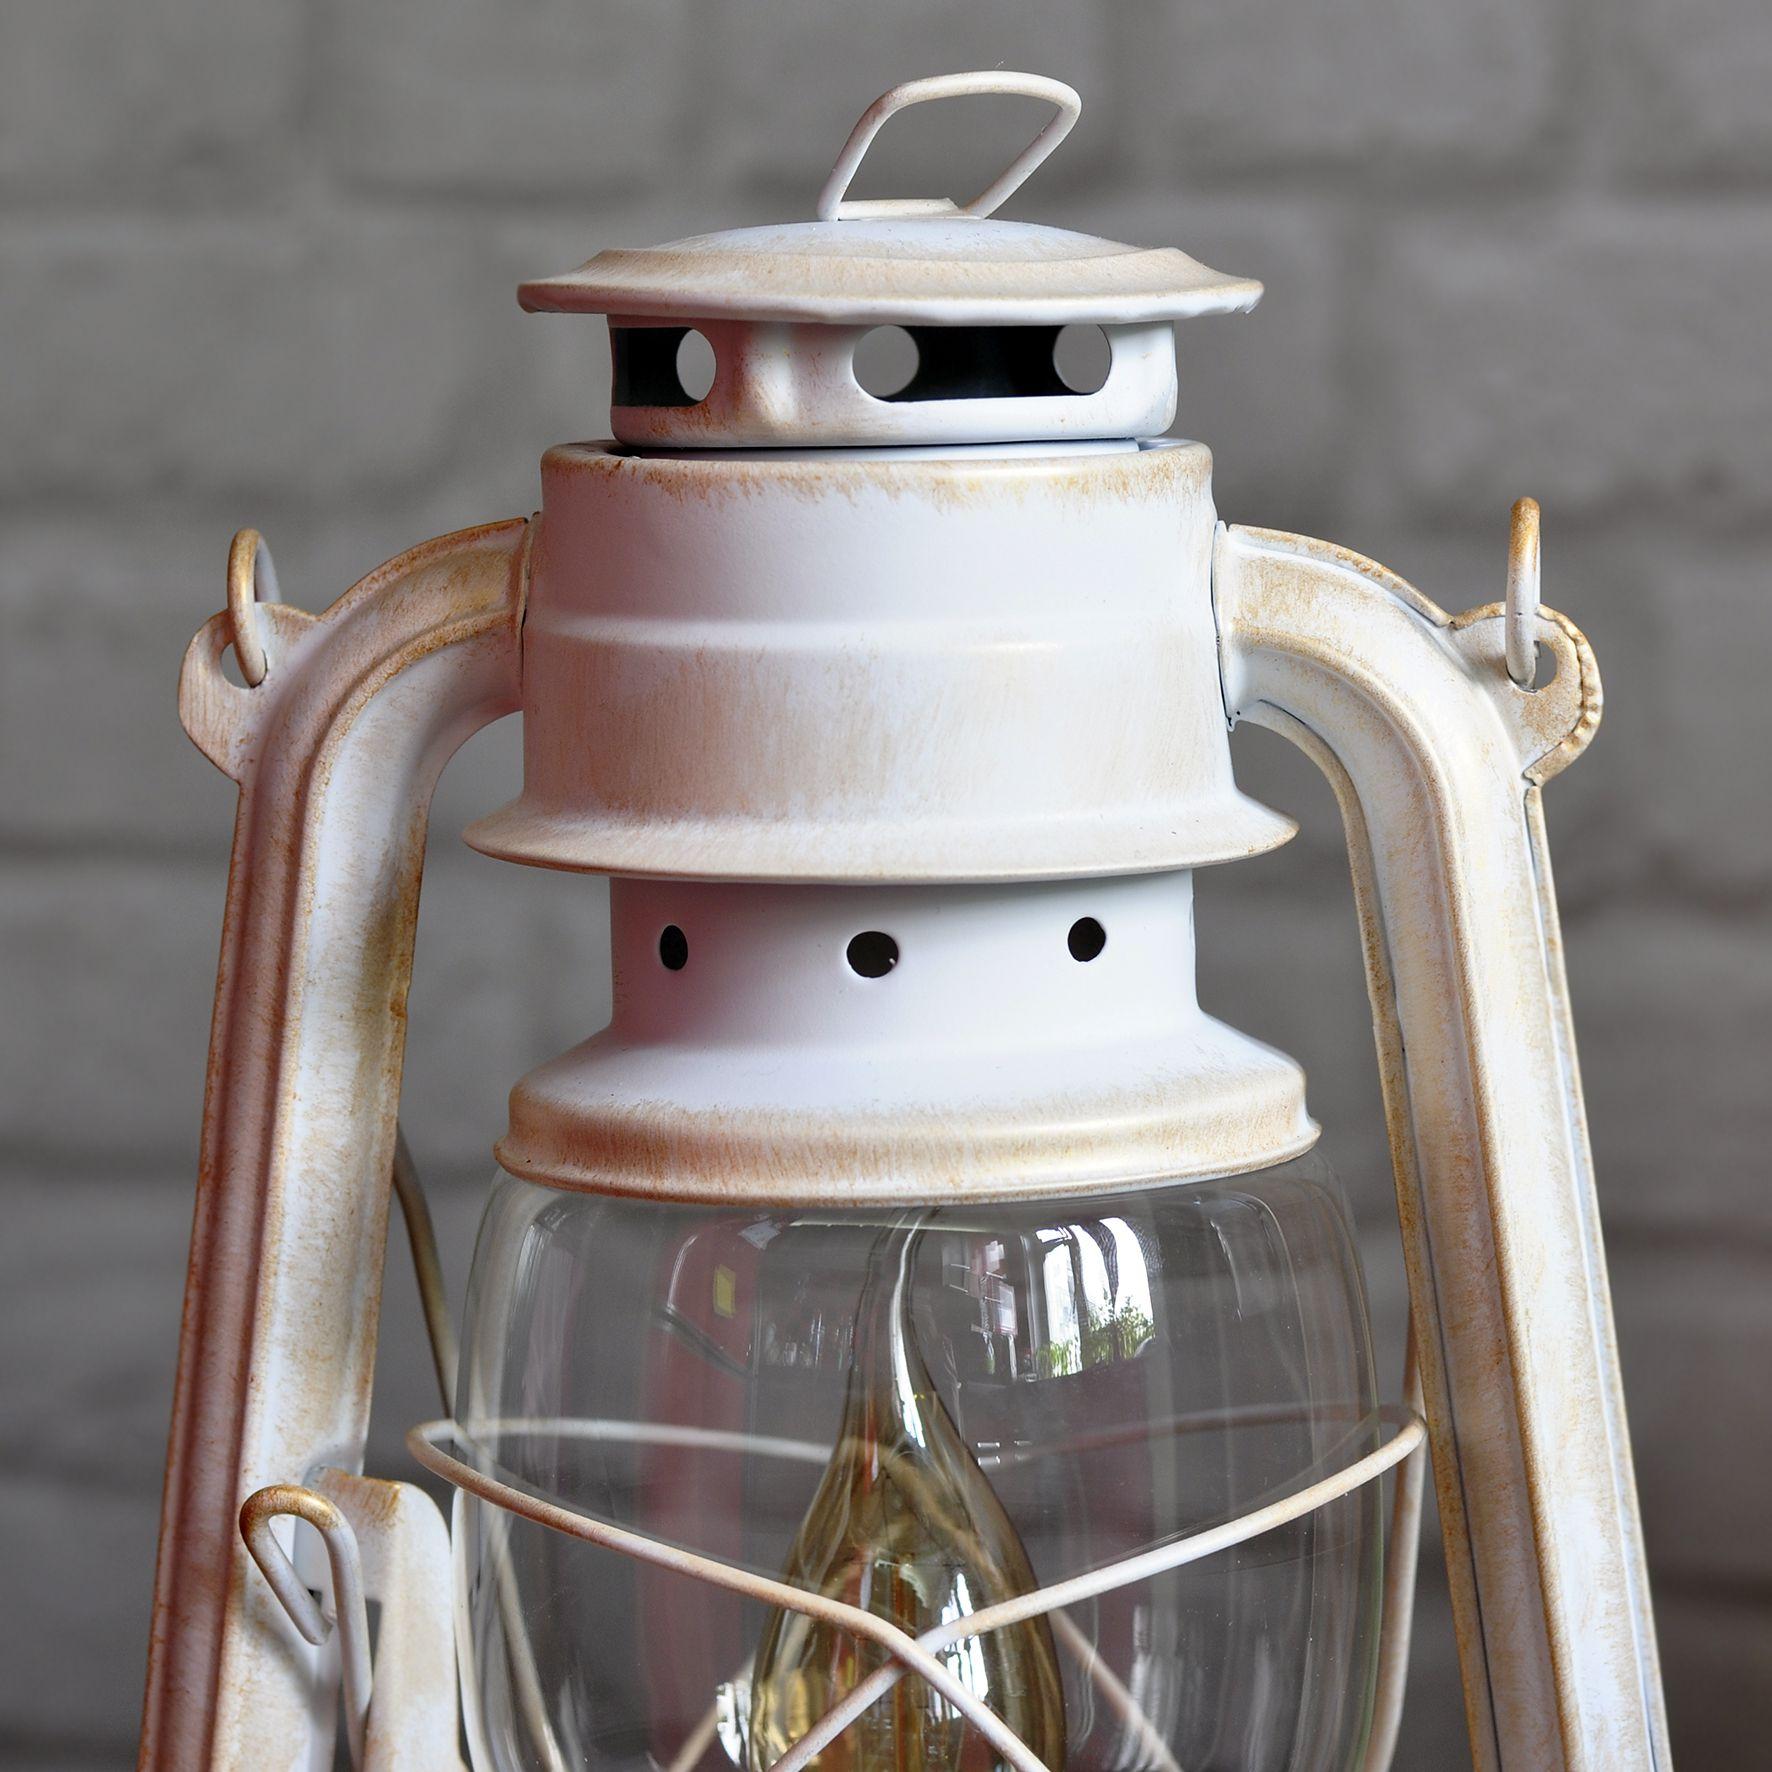 лампалофт ретролампа лампанадачу необычнаялампа купитьлампу винтажнаялампа керосинка ночник лампа лофт подарок винтаж ретро